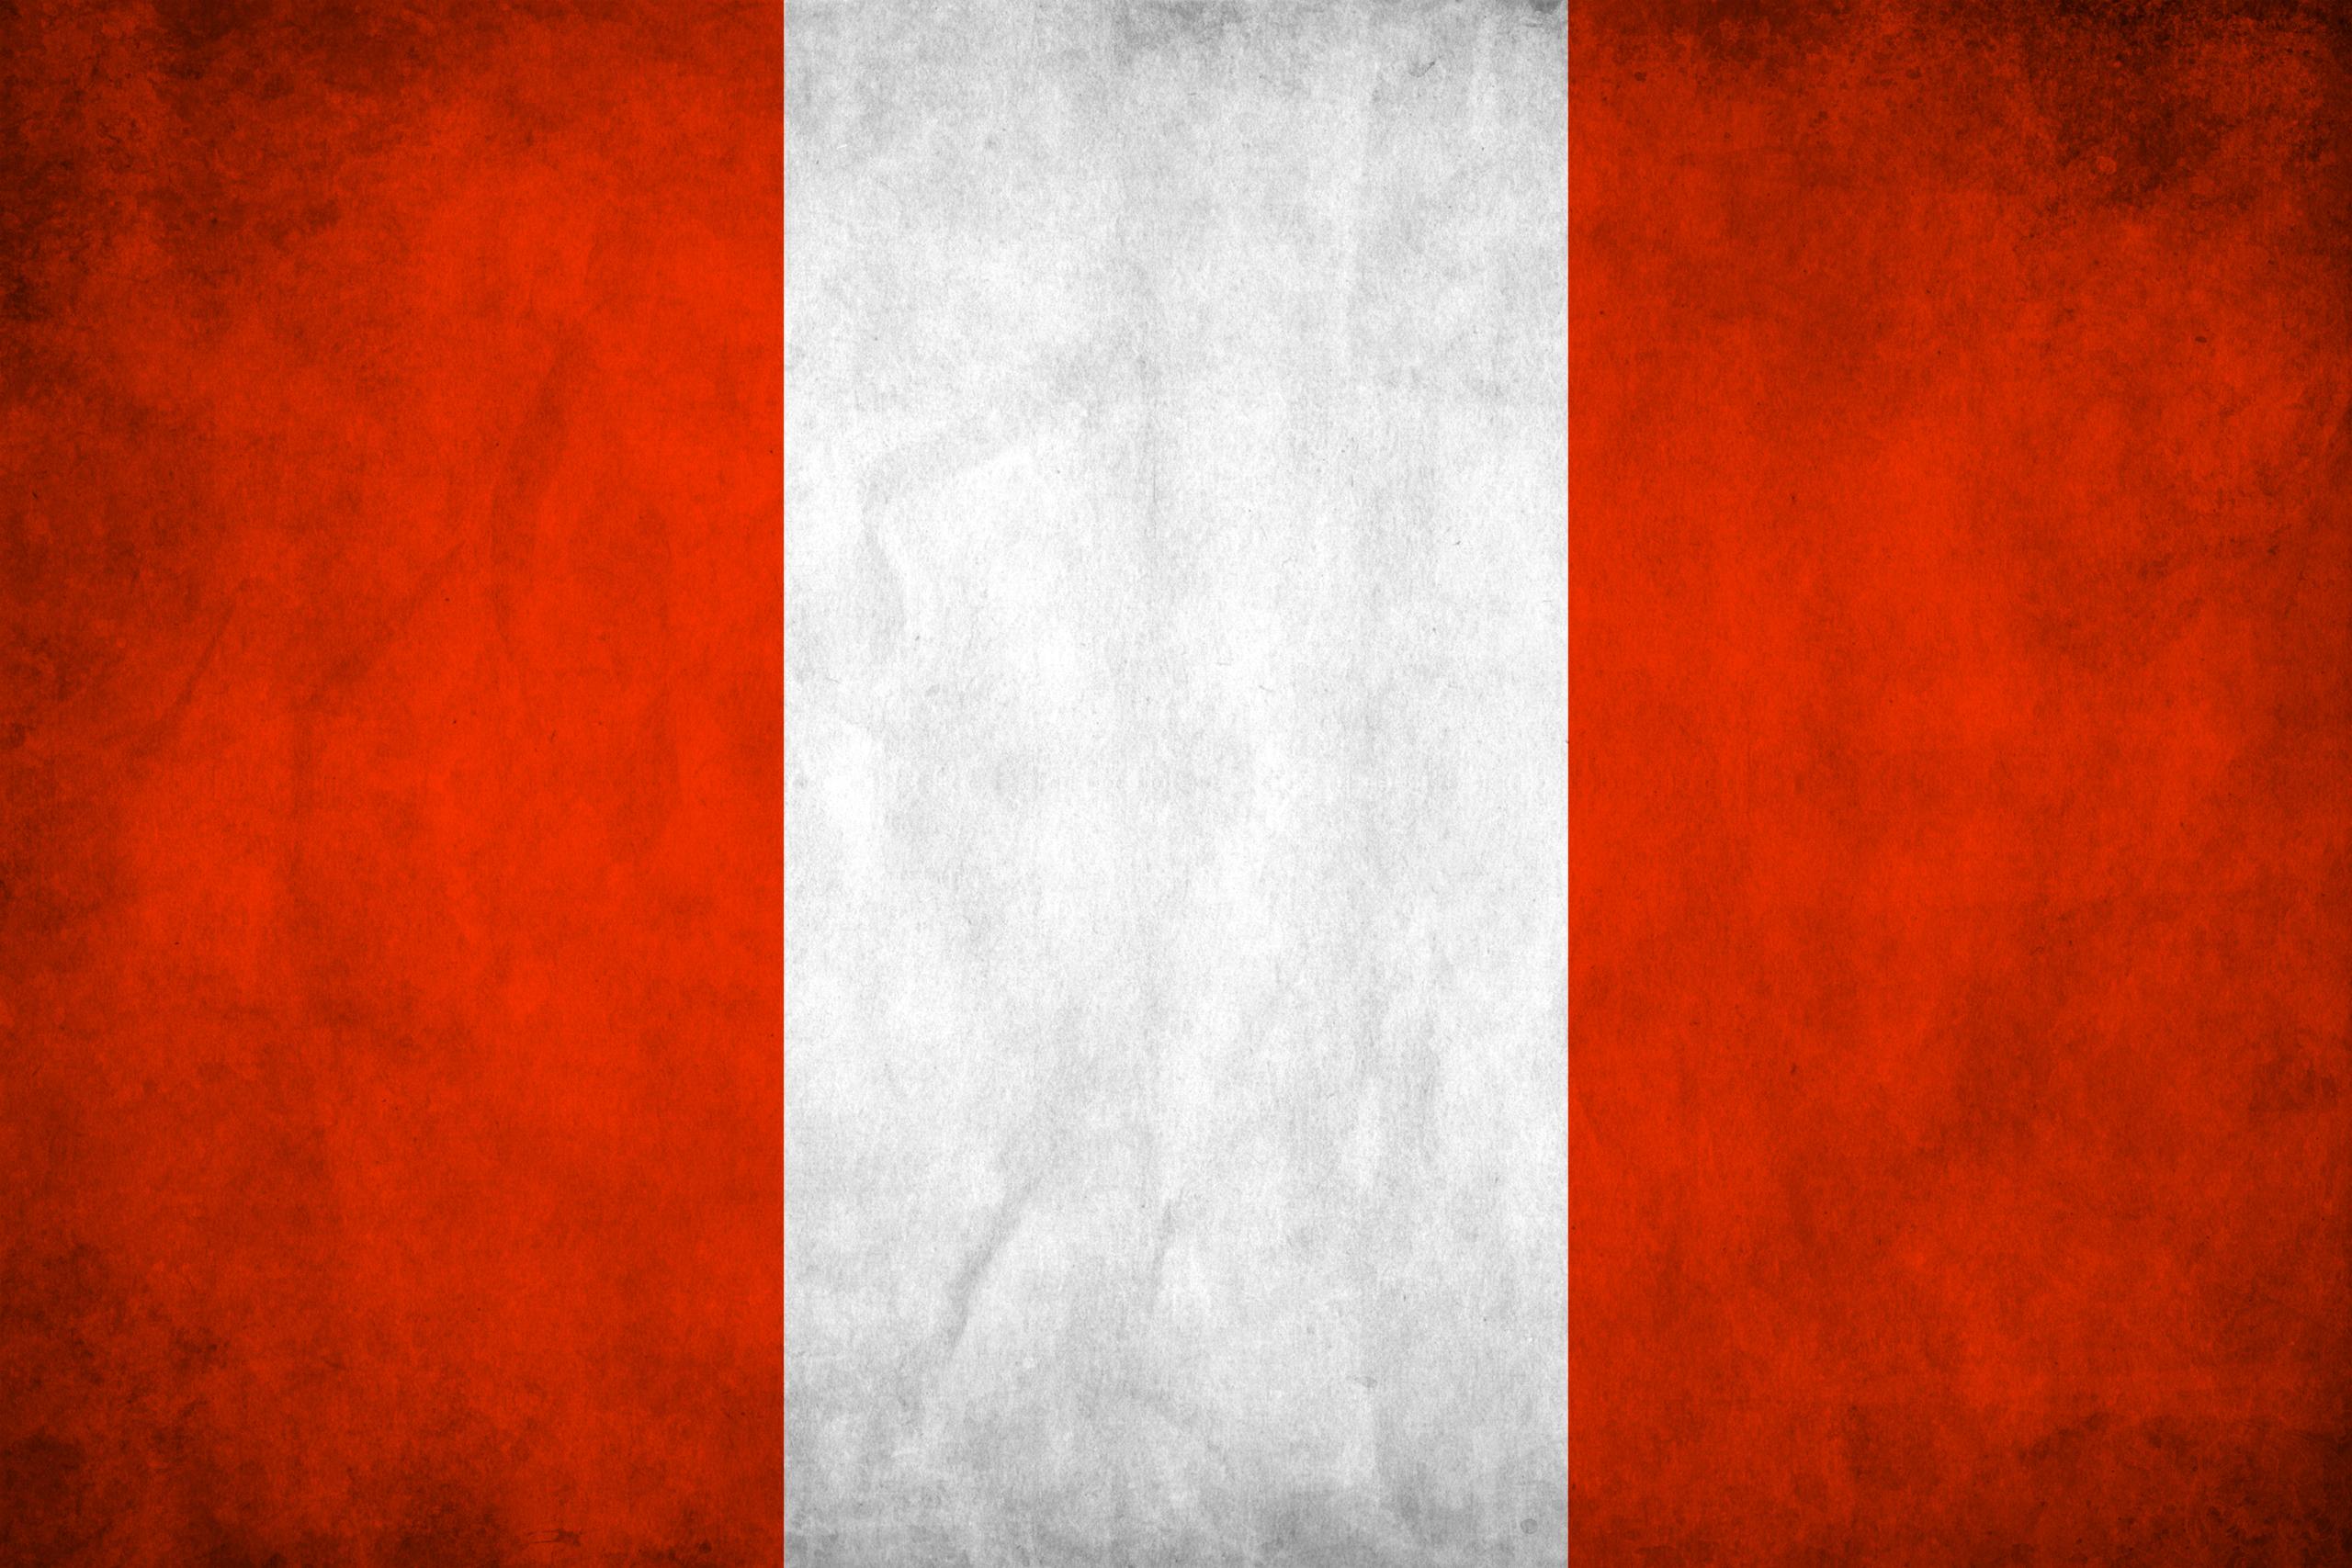 grunge, flags, Peru - Free Wallpaper / WallpaperJam.com